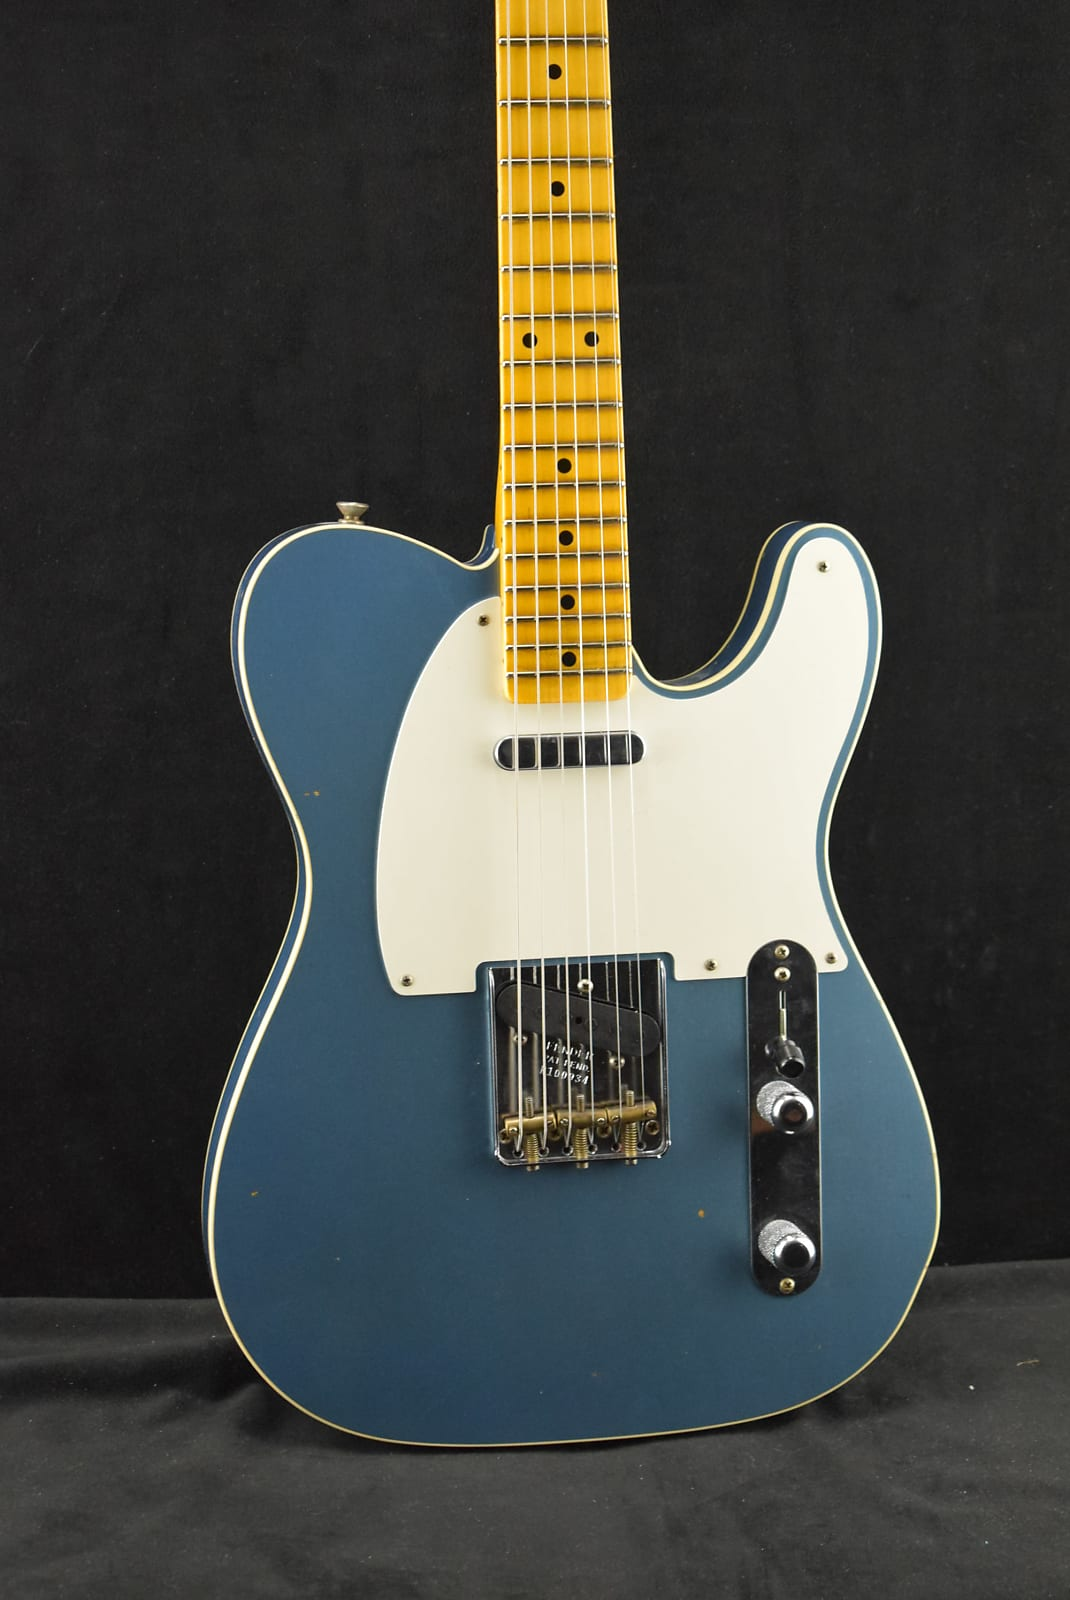 Fender '50s Tele Journeyman Relic Faded/Aged Lake Placid Blue